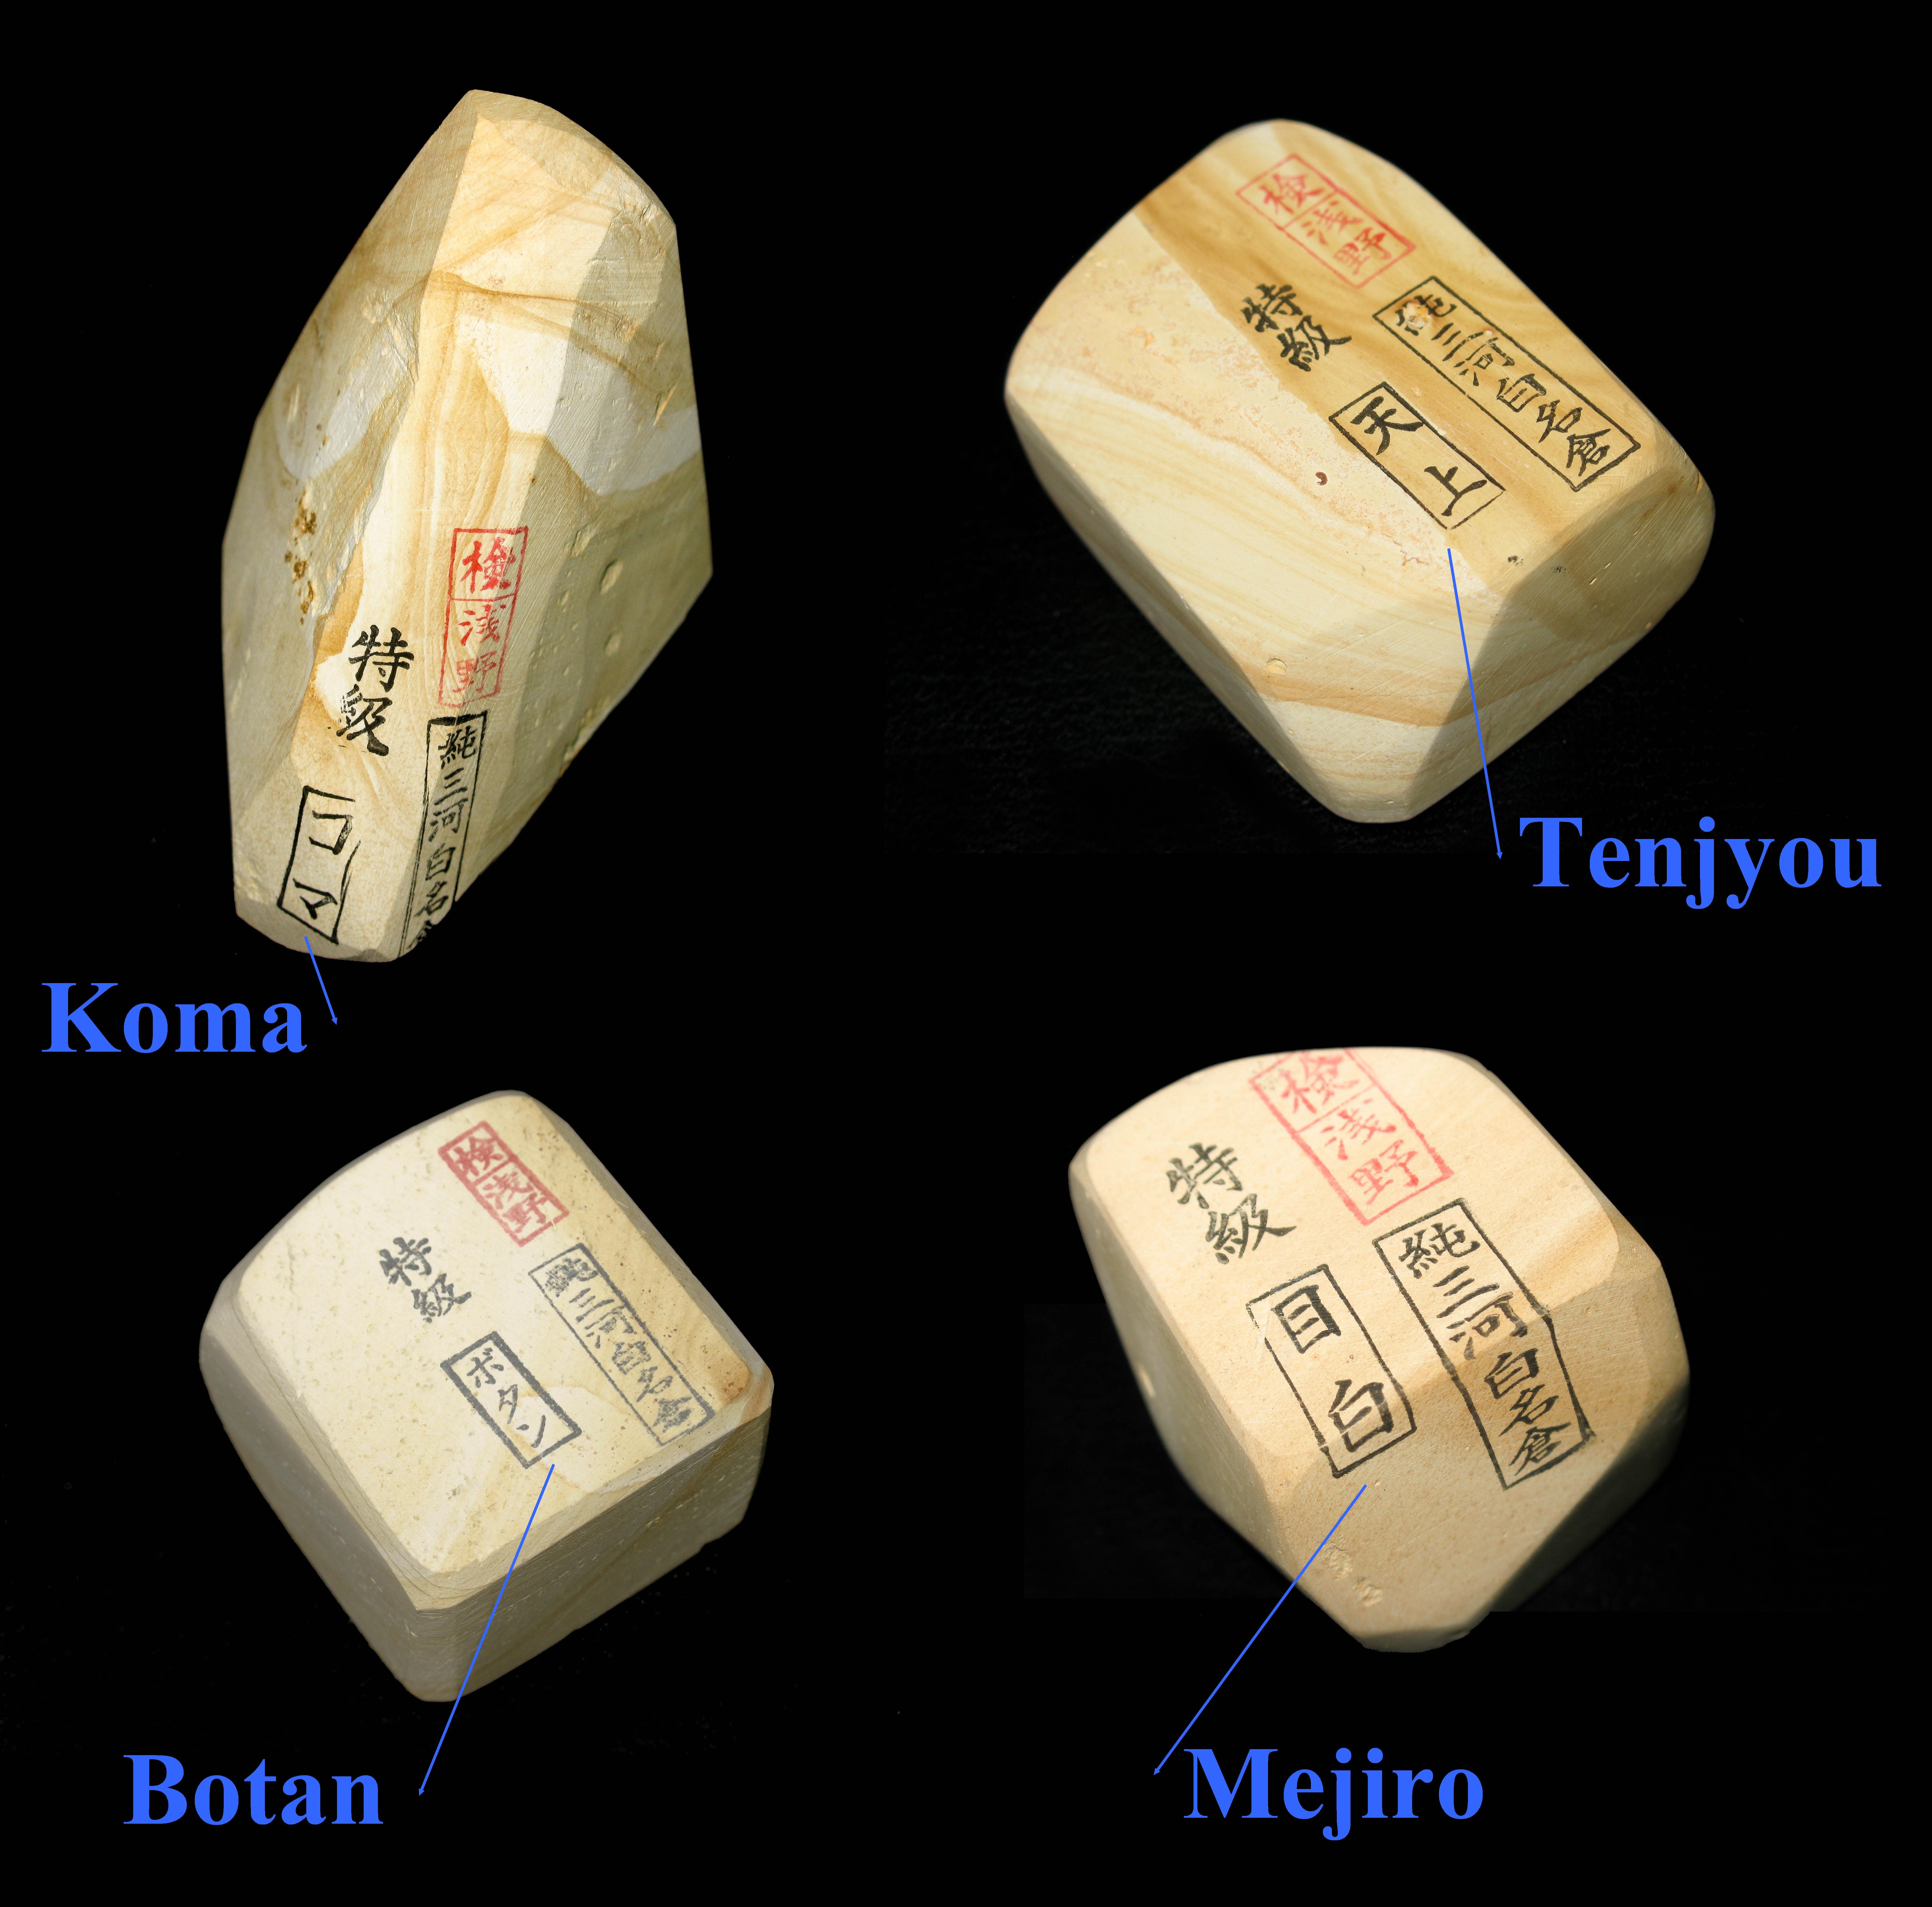 Botan (ボタン), Tenjyou (天上), Mejiro (目白) Koma (コマ)